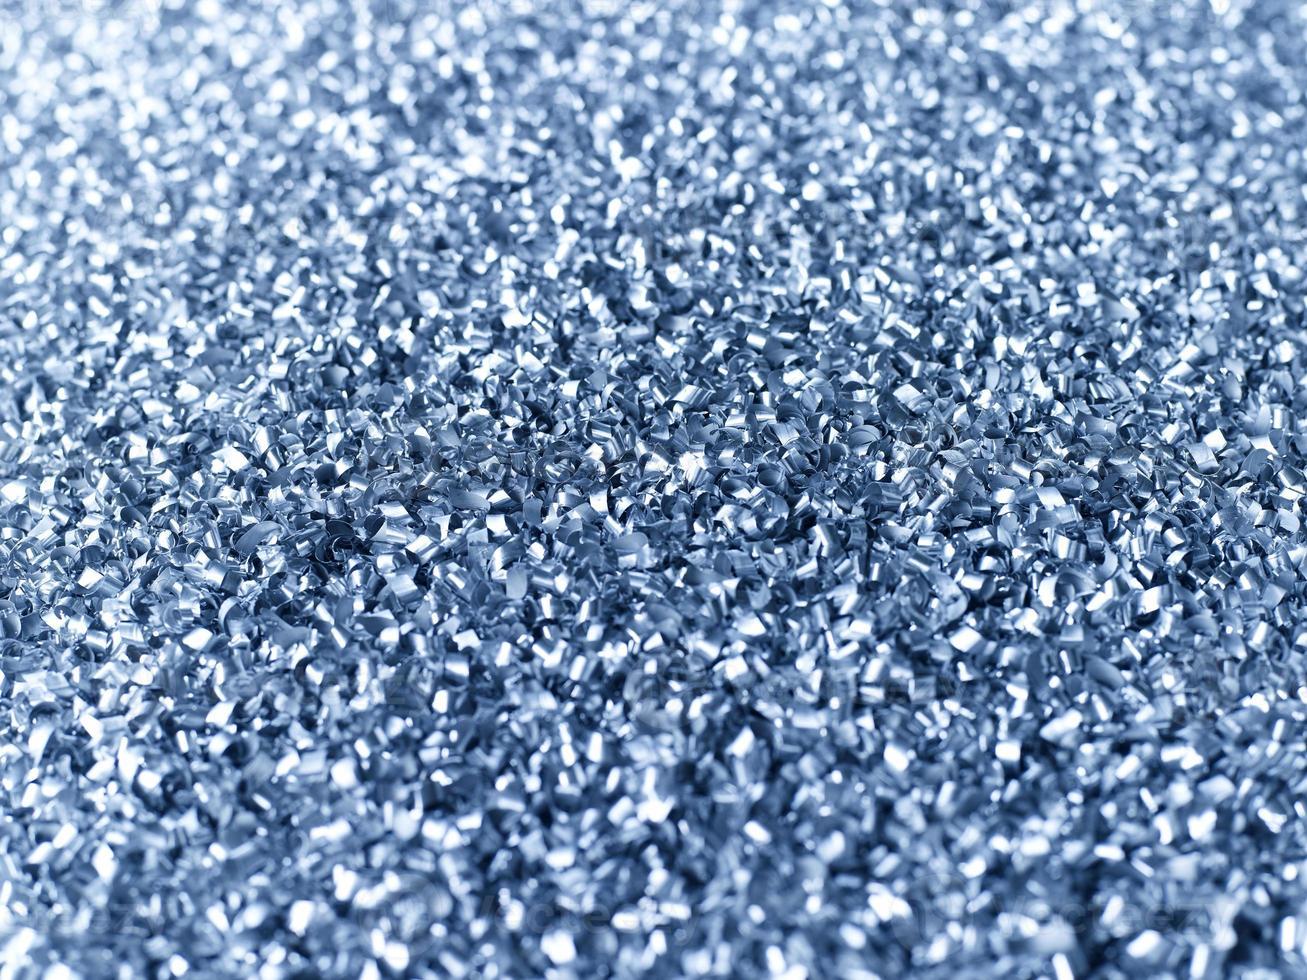 chips de aluminio reunidos para reciclar foto